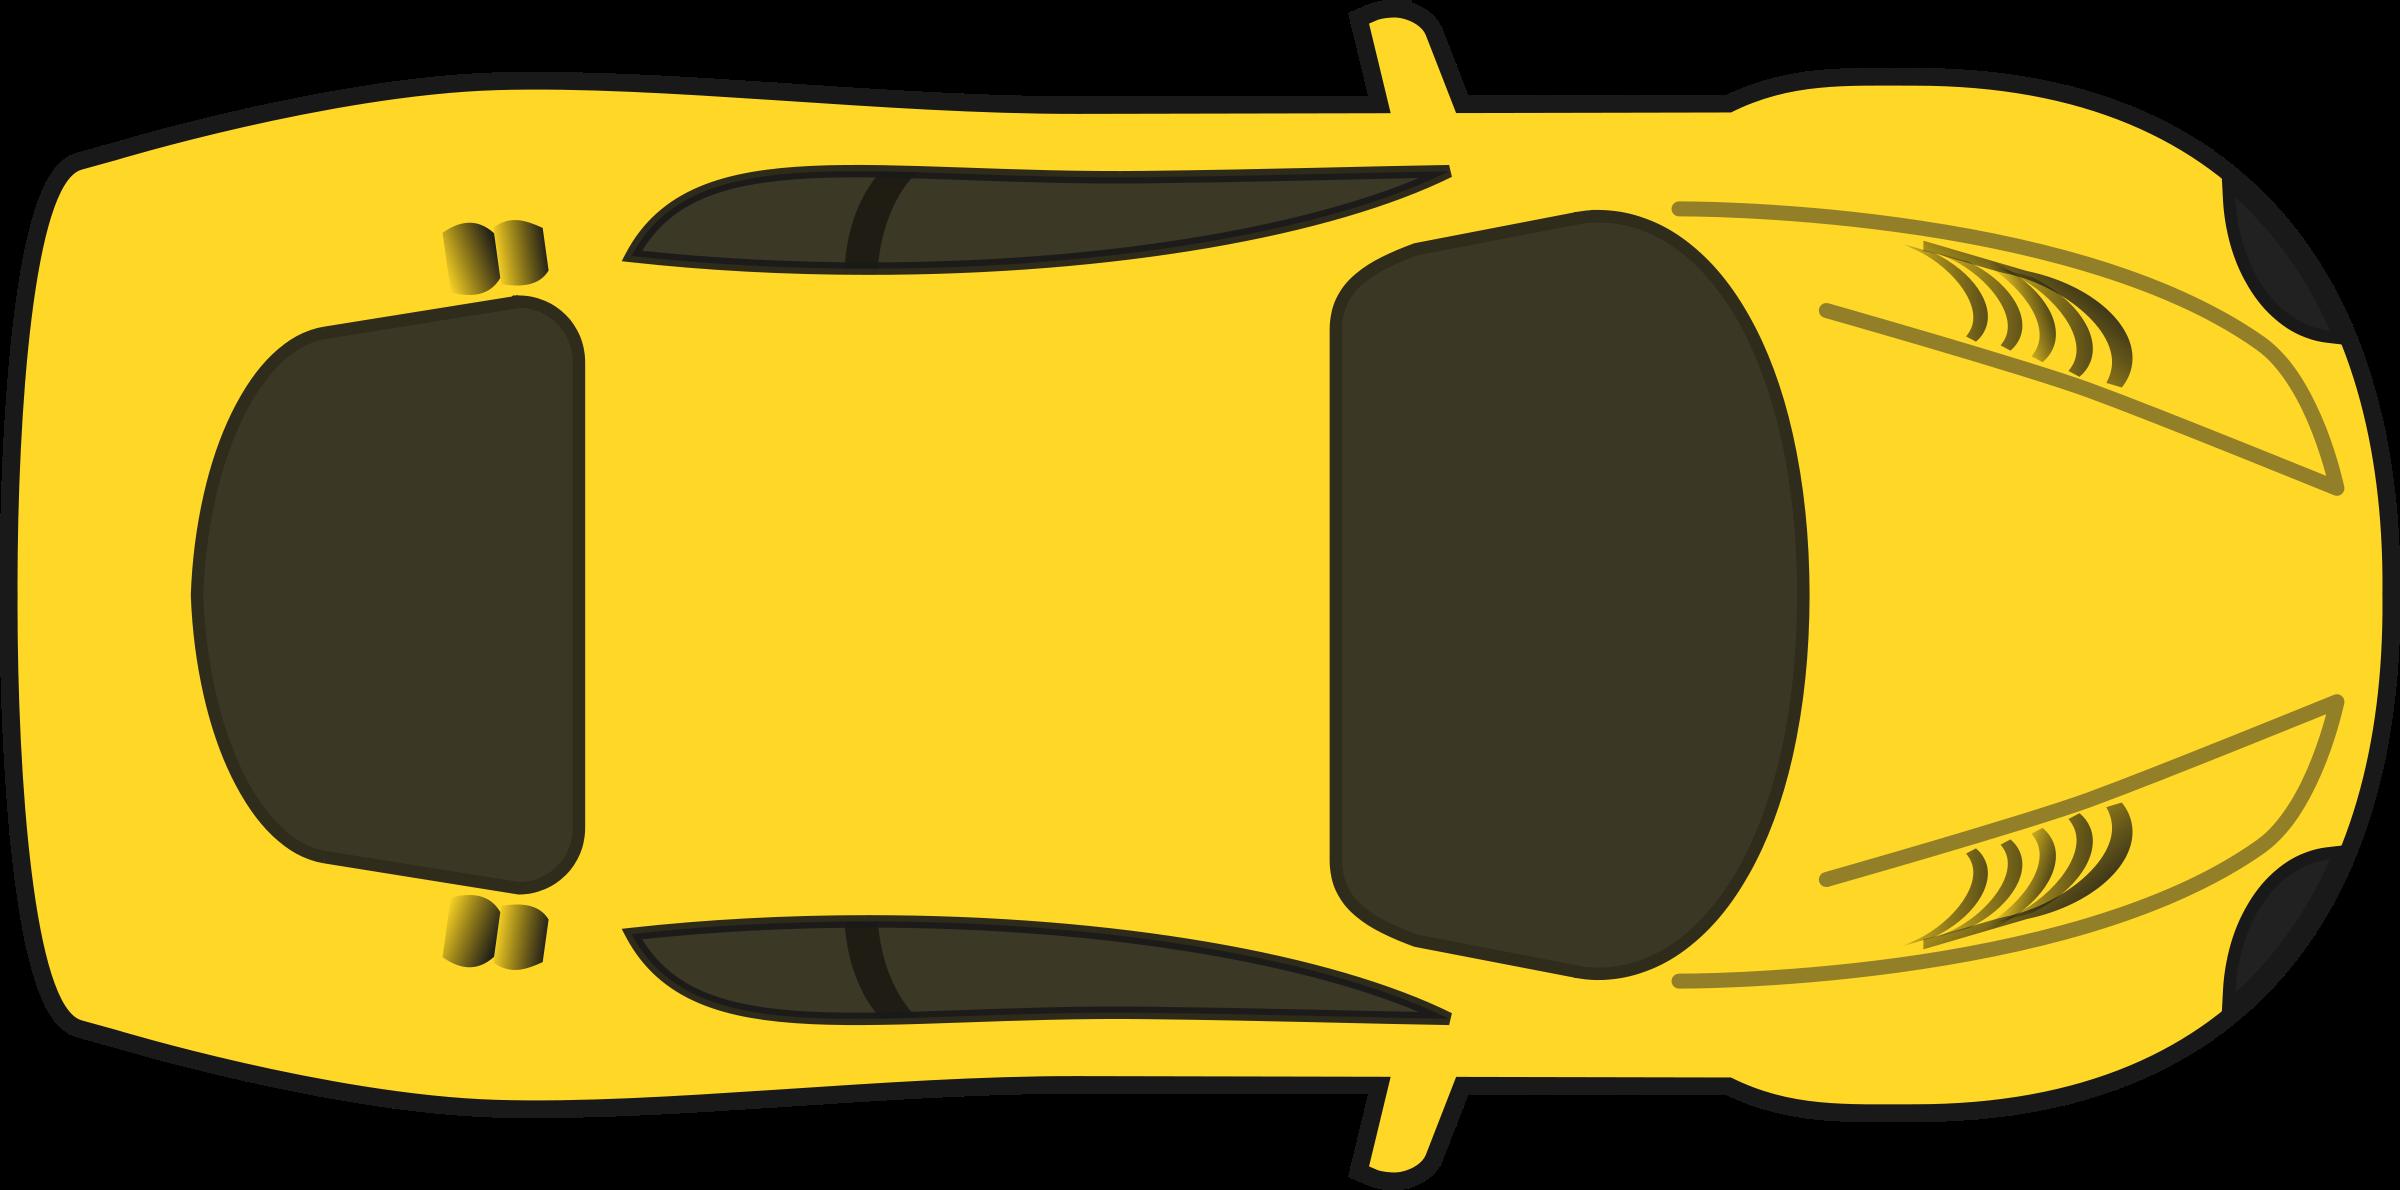 Best car clipart download Best Car Clipart Top View #28640 - Clipartion.com download